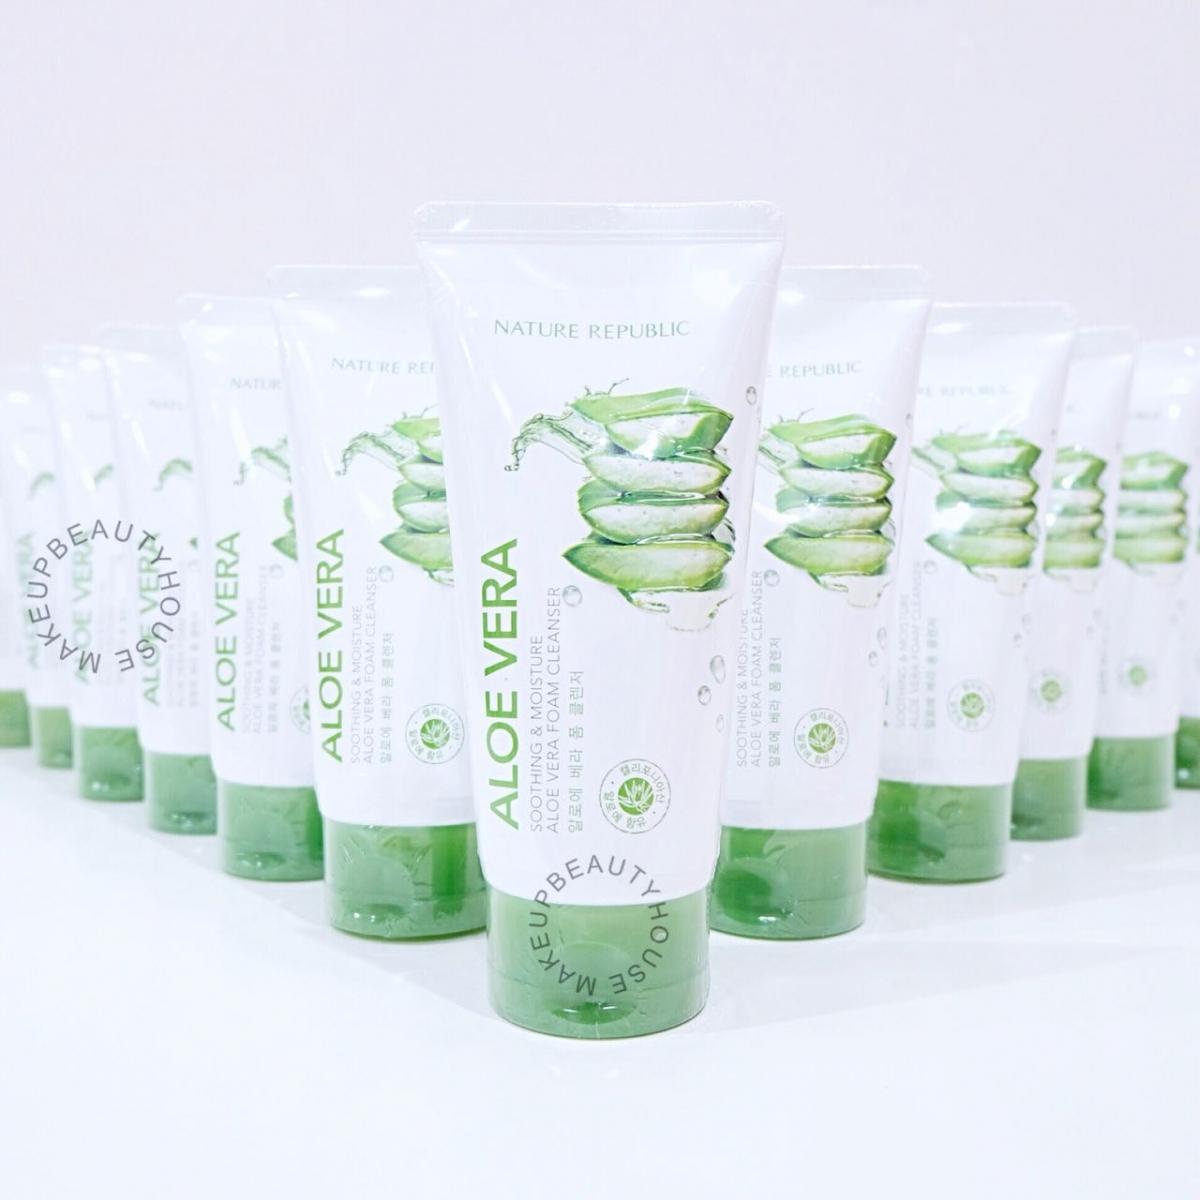 Soothing Moisture Aloe Vera Foam Cleanser Makeup Beauty House Nature Republic Prev Next